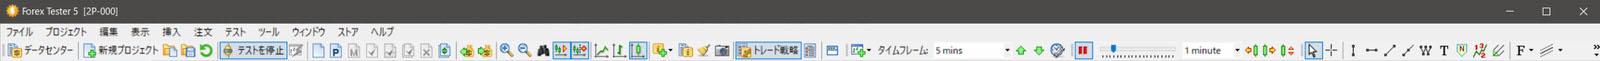 Forex Tester 従来のツールバー